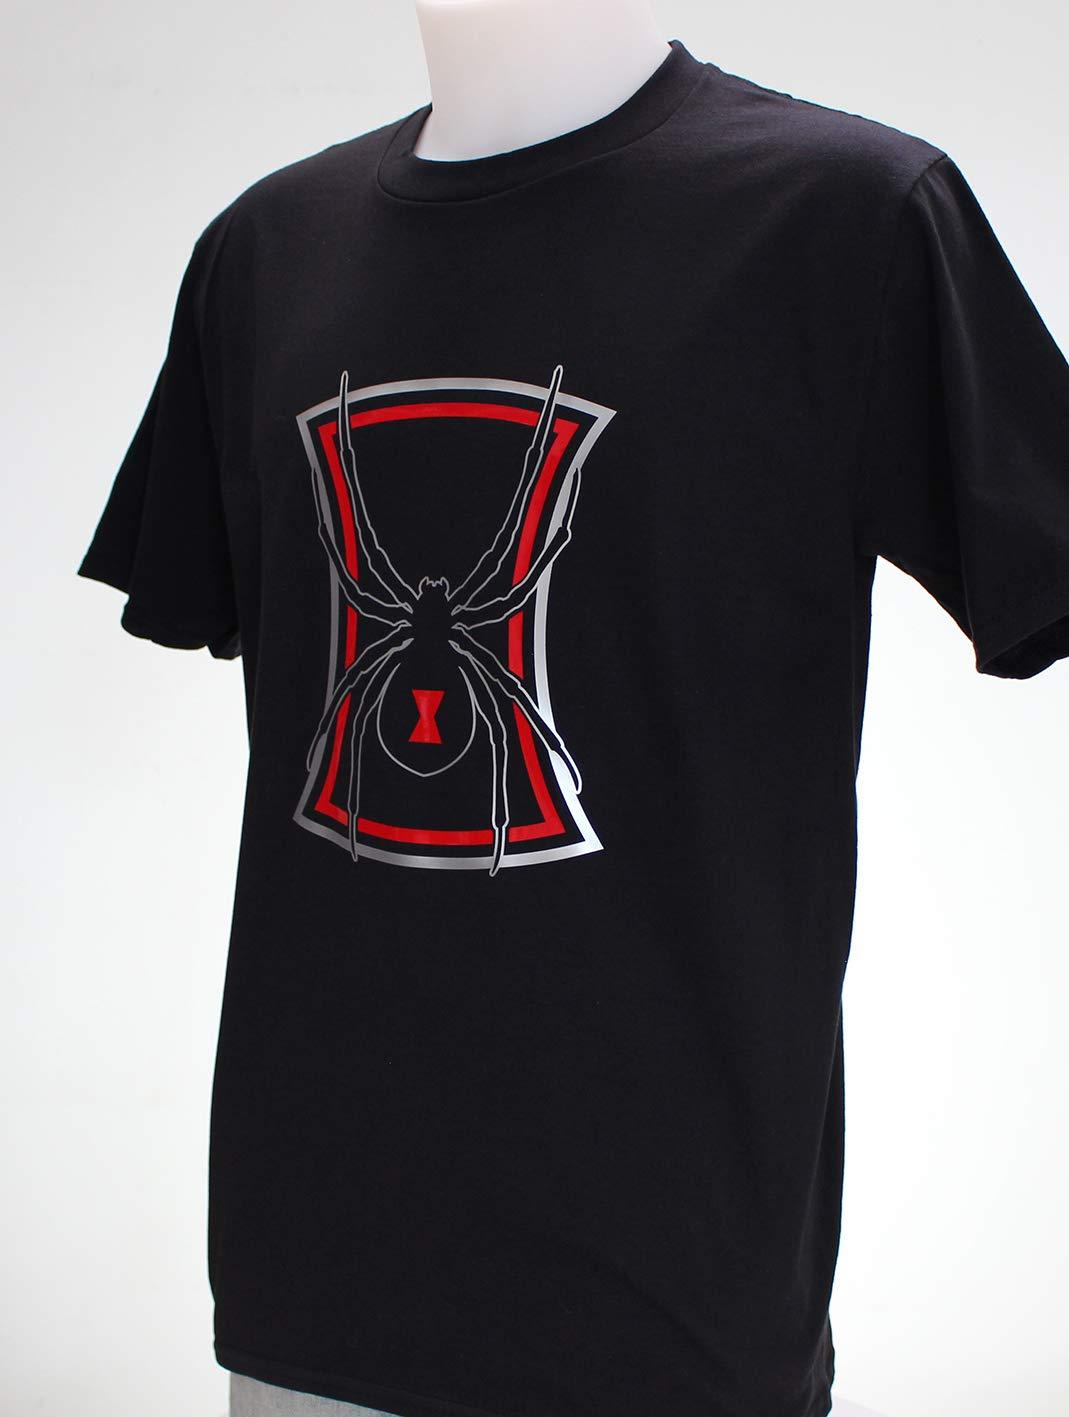 Black Spider camiseta negra de chico: Amazon.es: Handmade